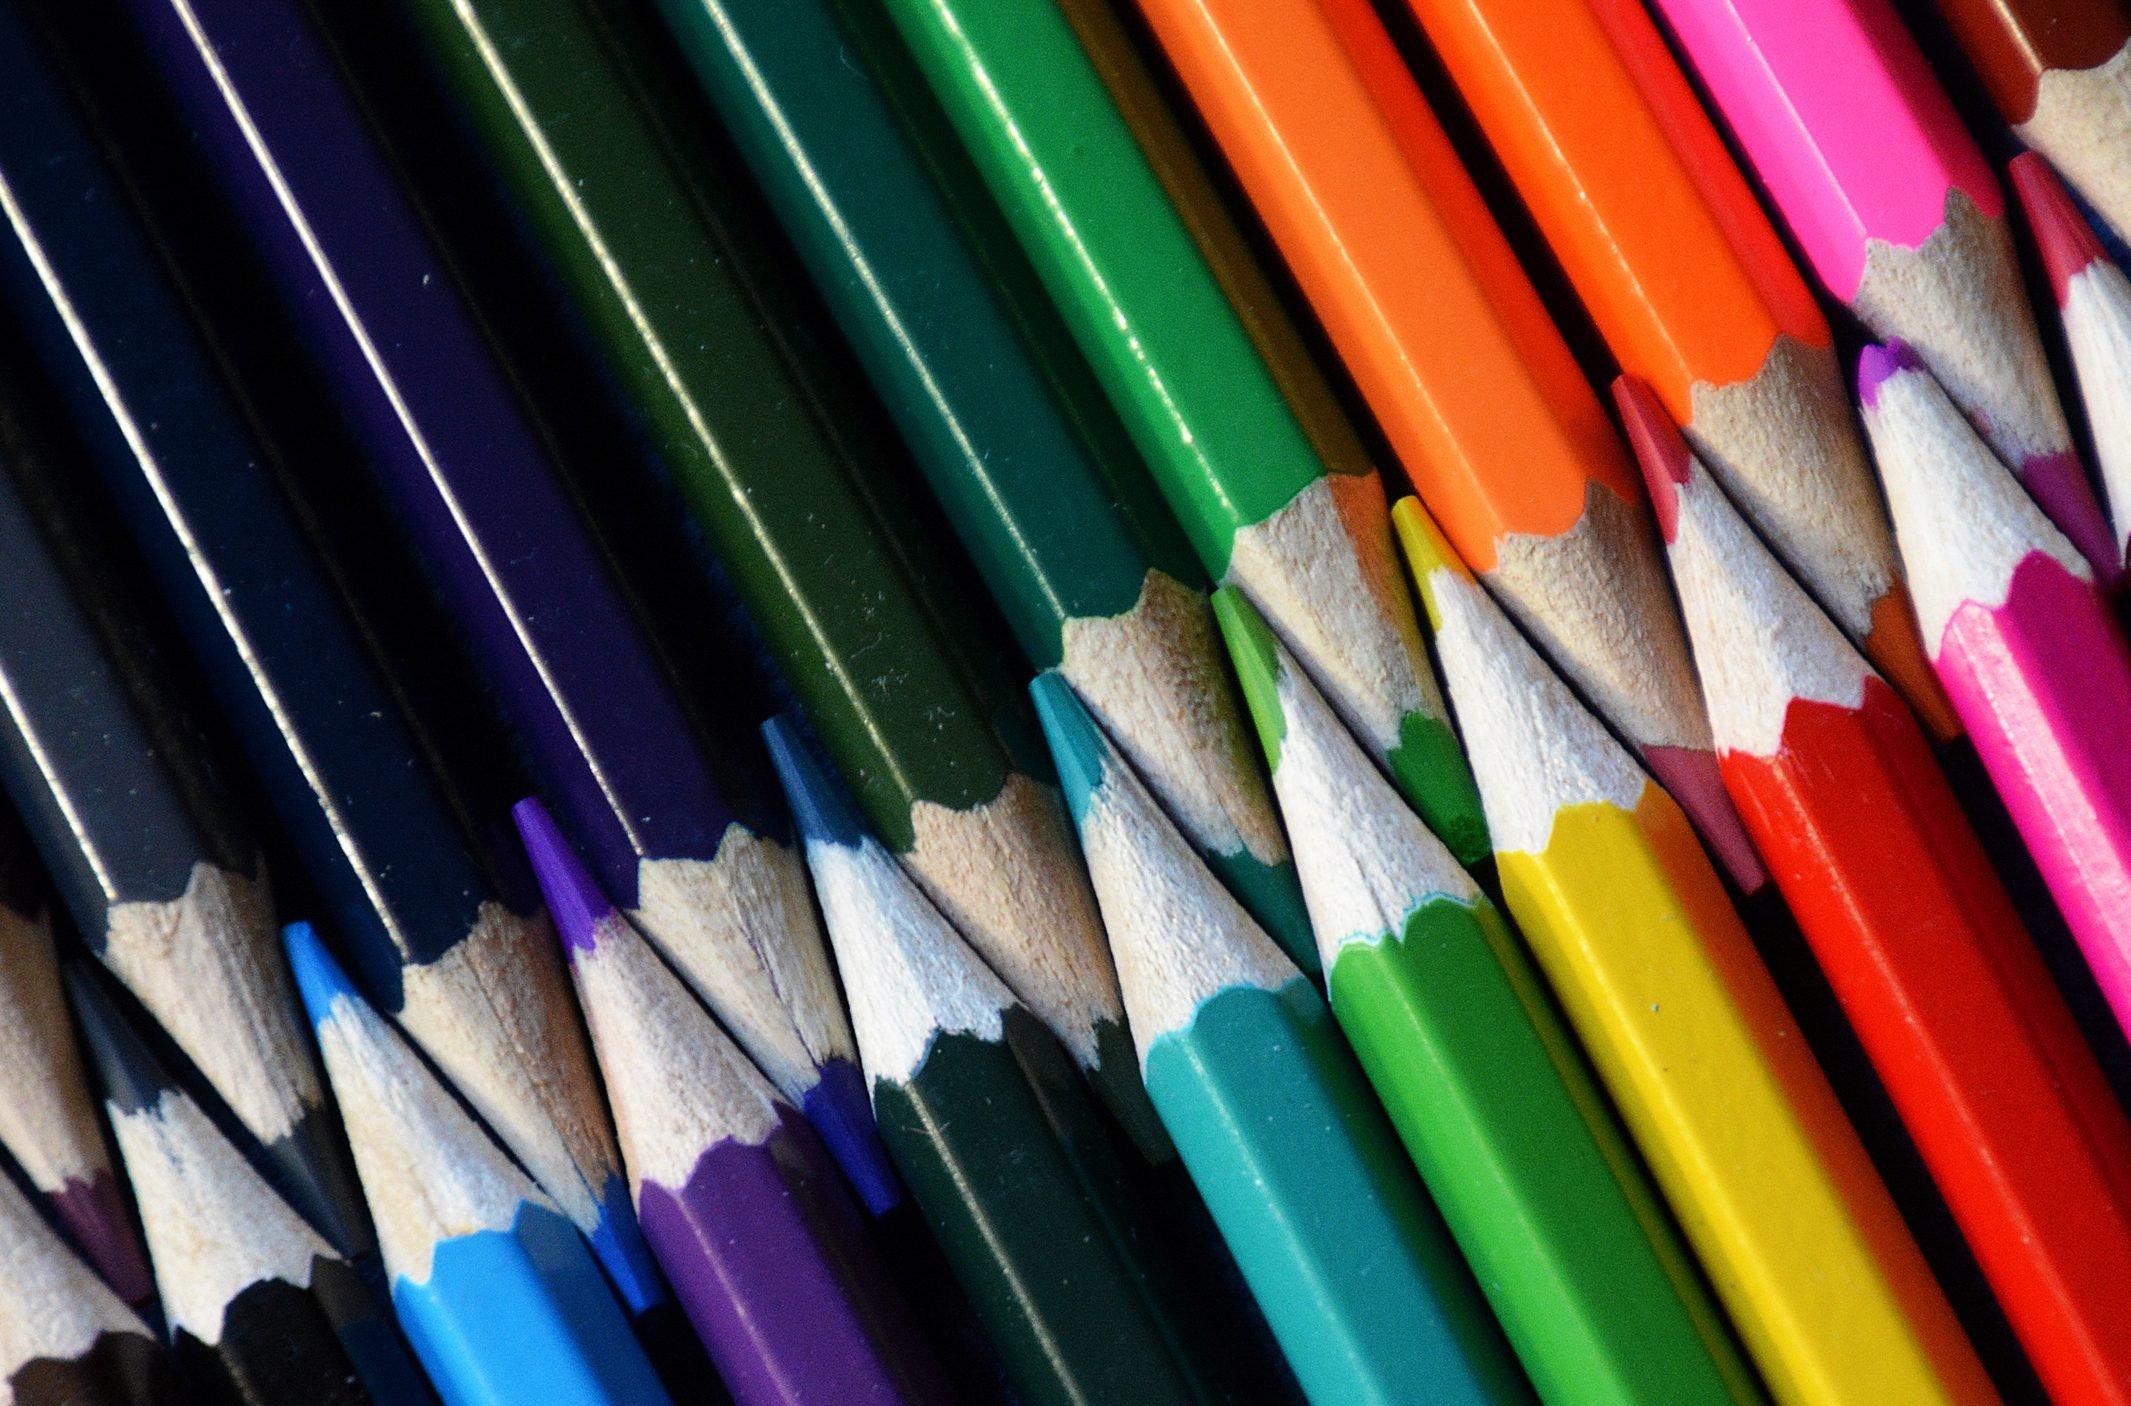 Multicoloured pencils France